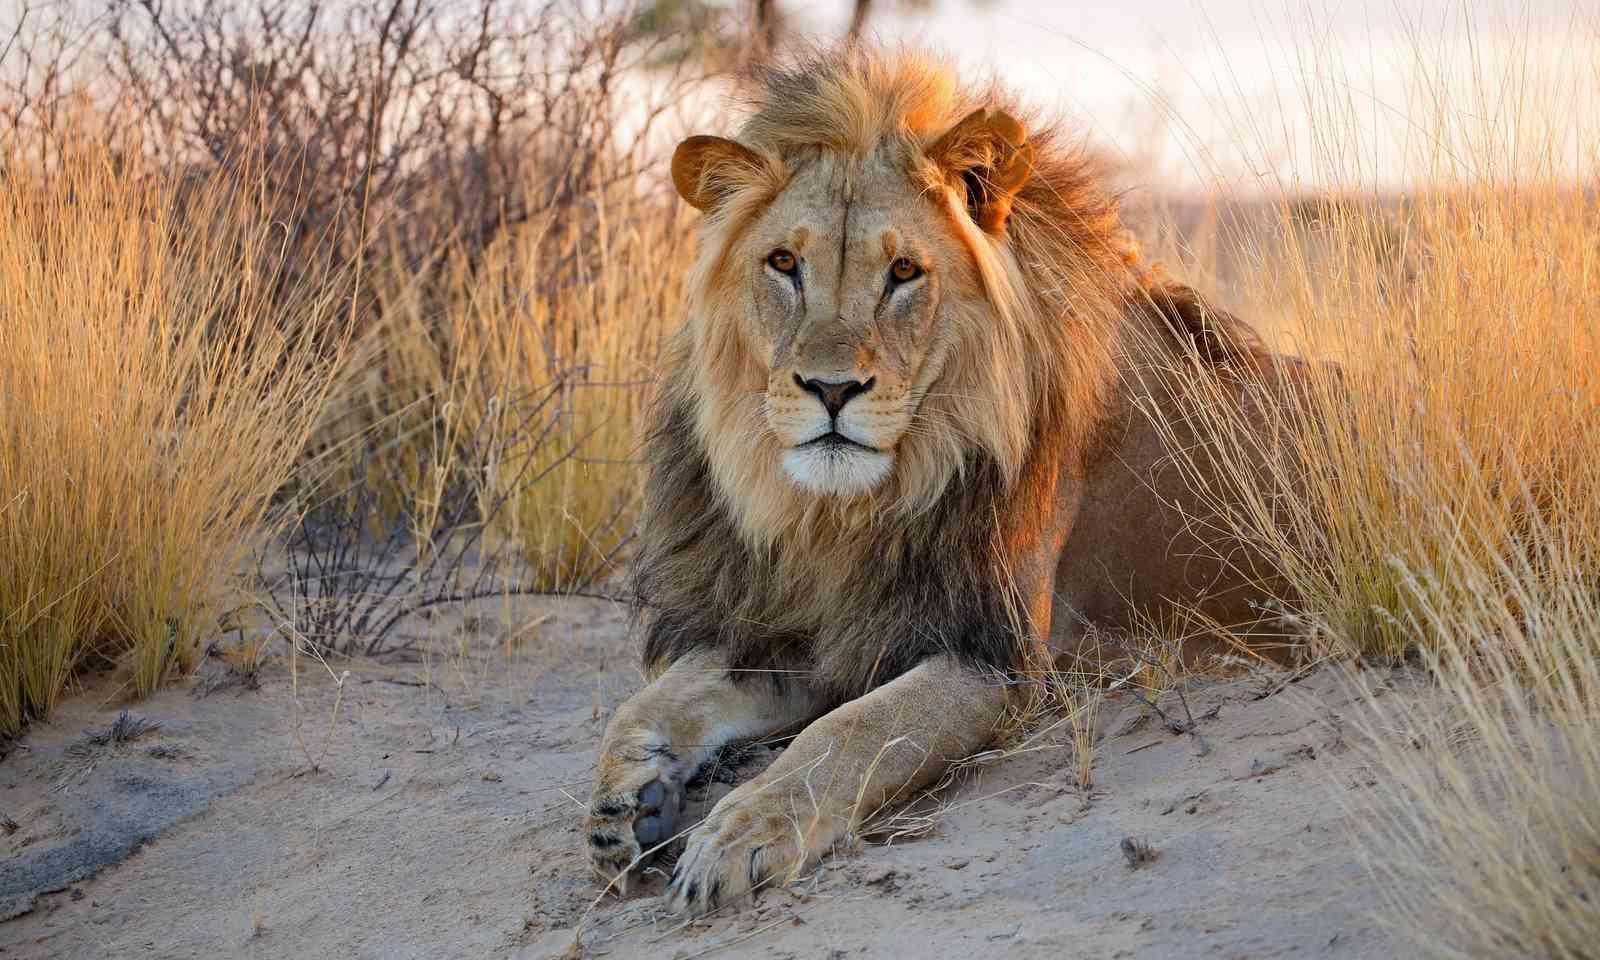 Lion in the Kalahari (Shutterstock.com)